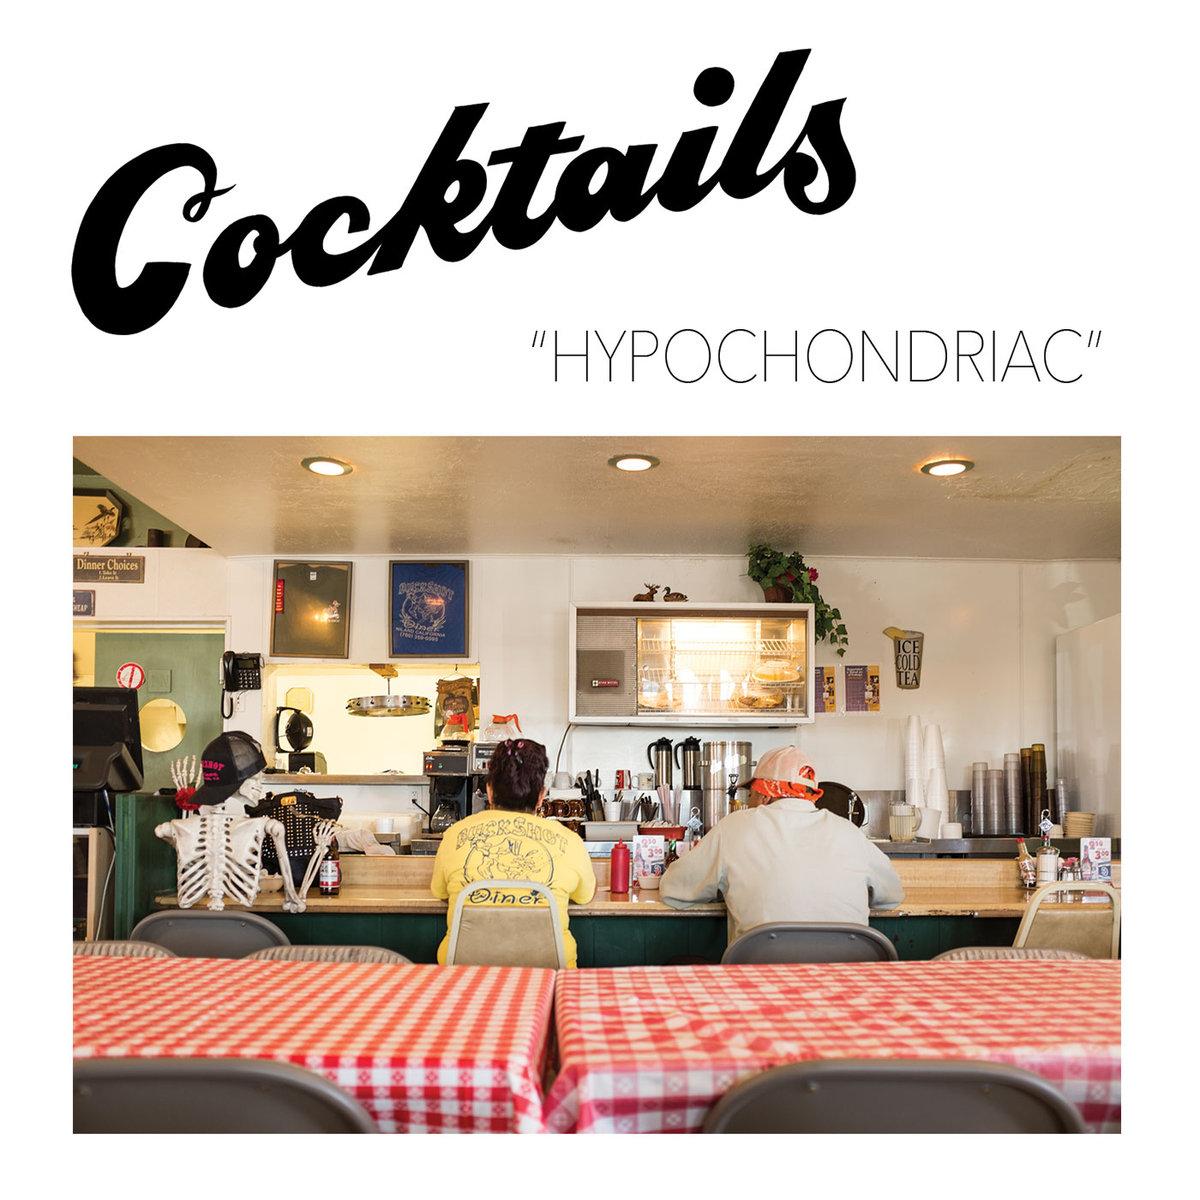 Cocktails-Hypochondriac.jpg